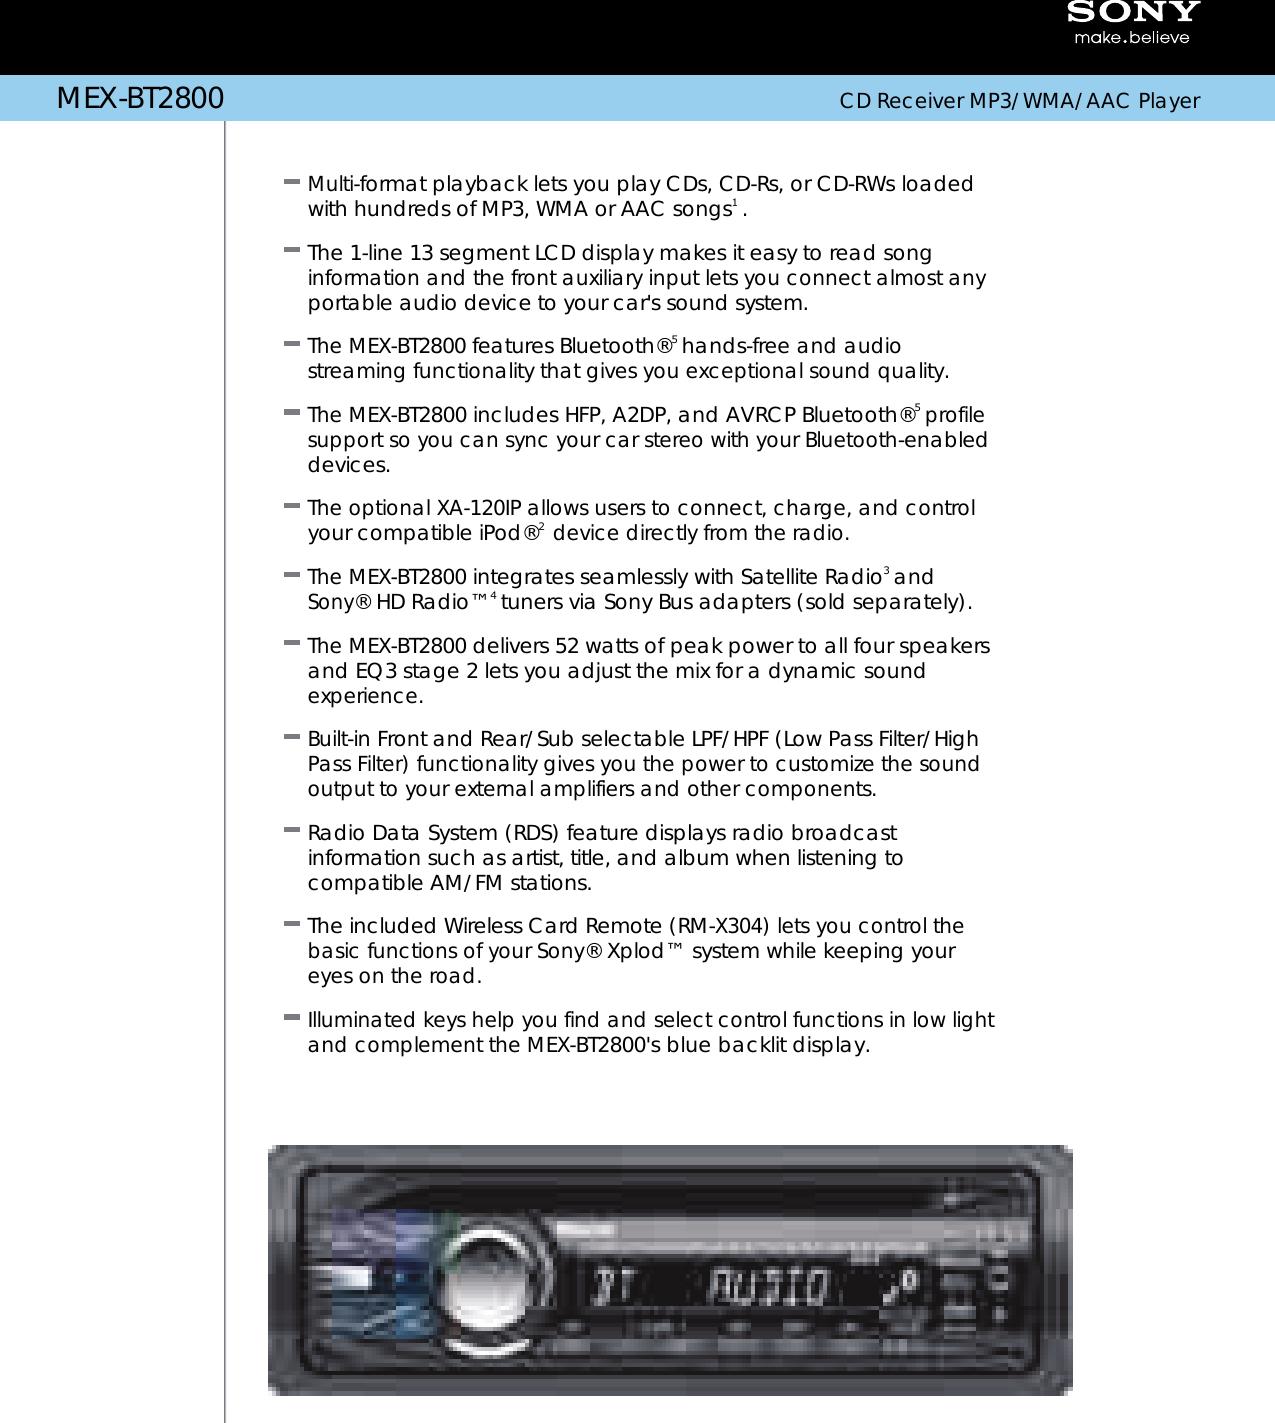 Sony Mex Bt2800 Users Manual